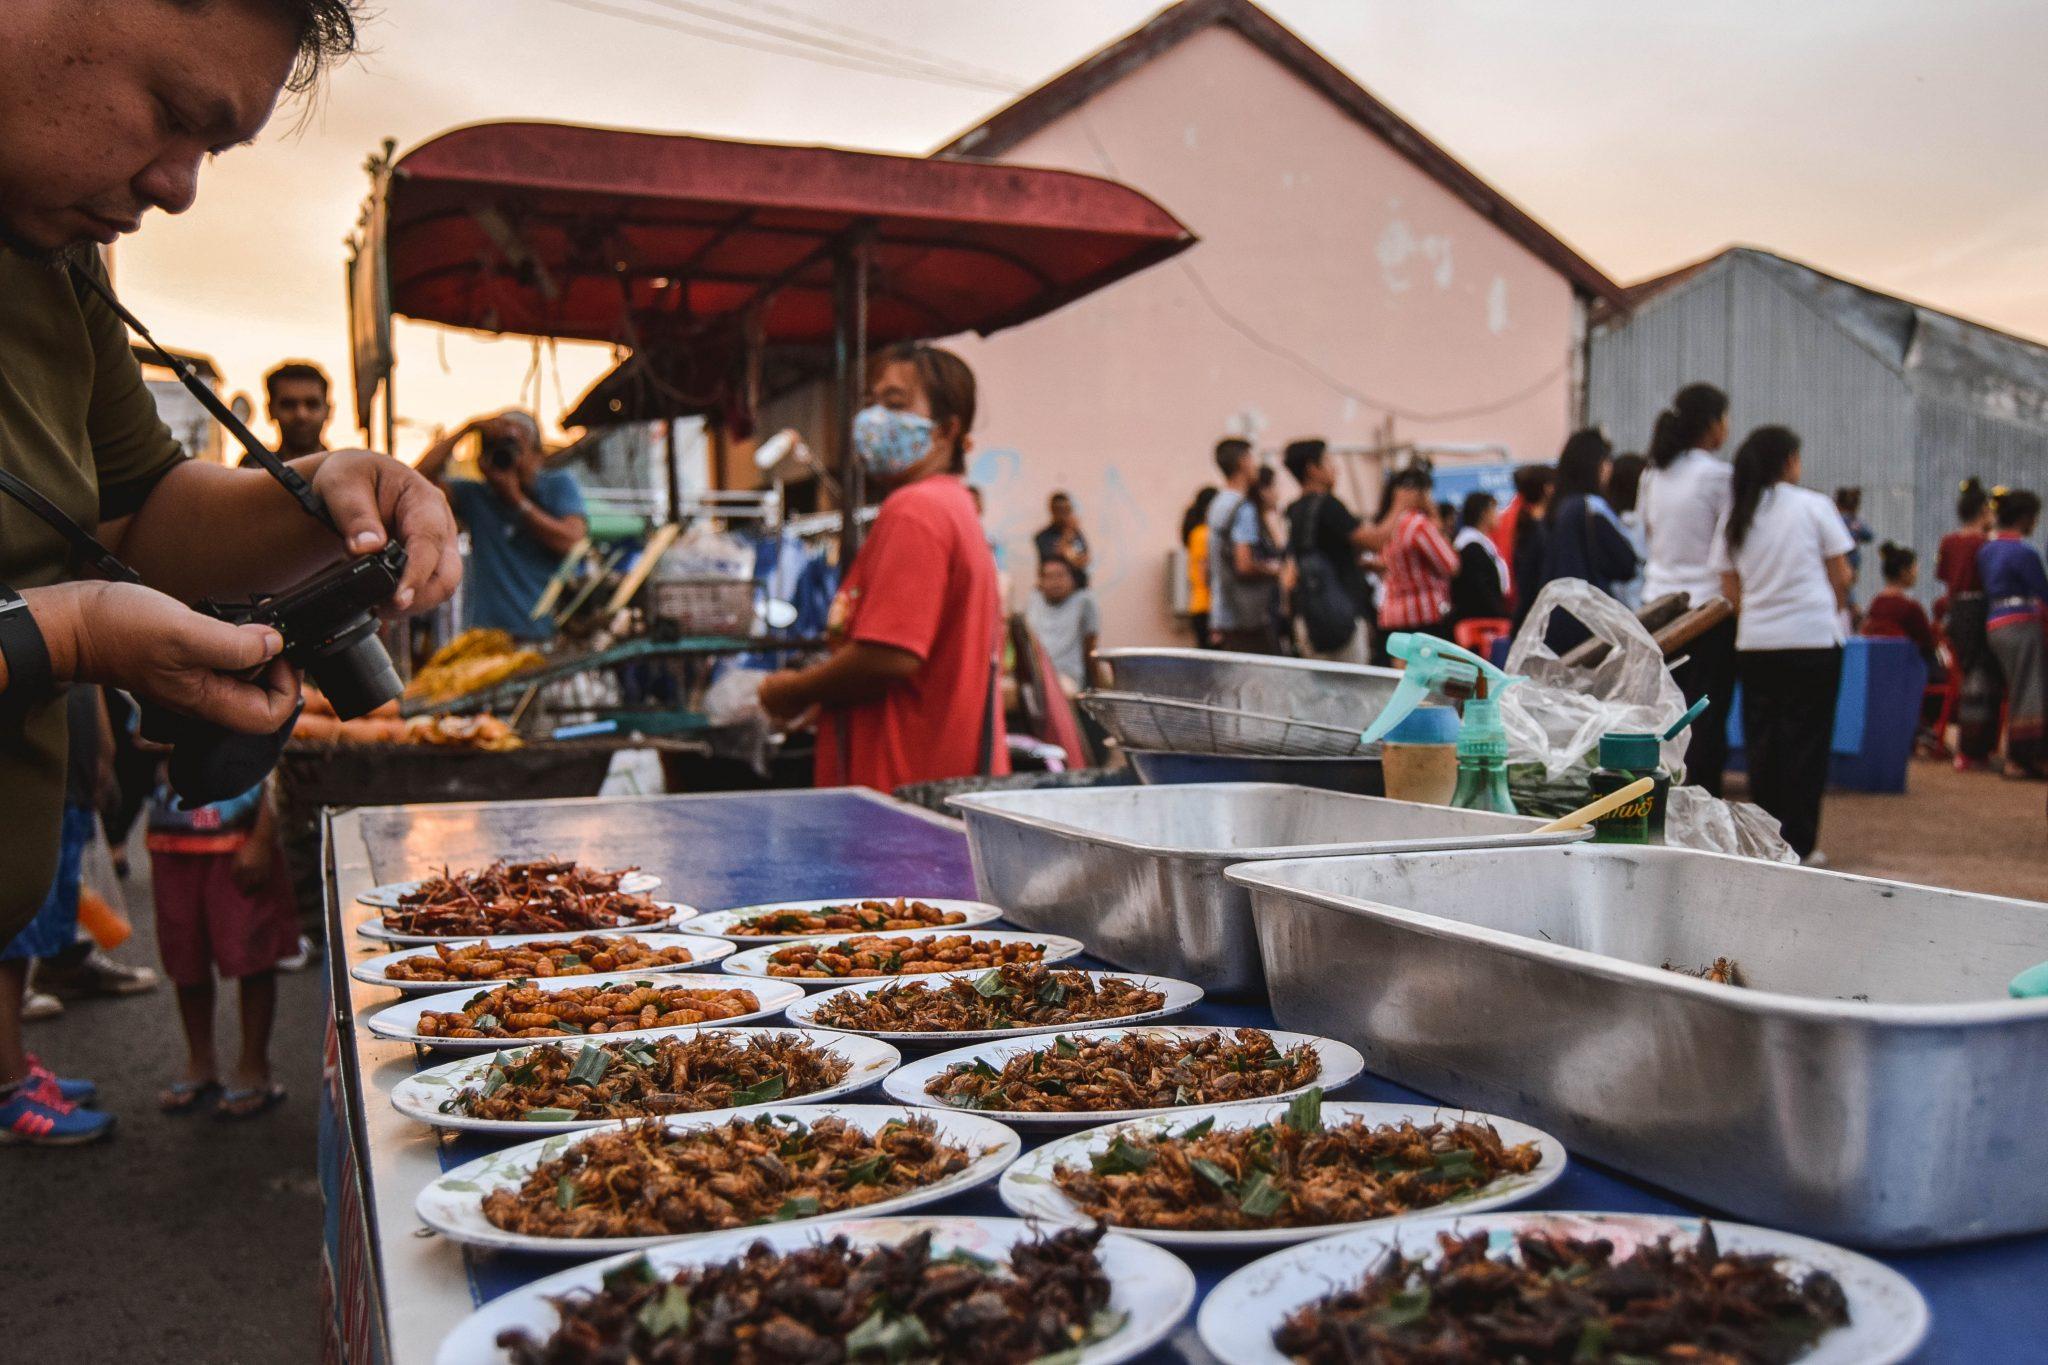 Wanderers & Warriors - 7 Things To Do In Nakhon Phanom Night Market